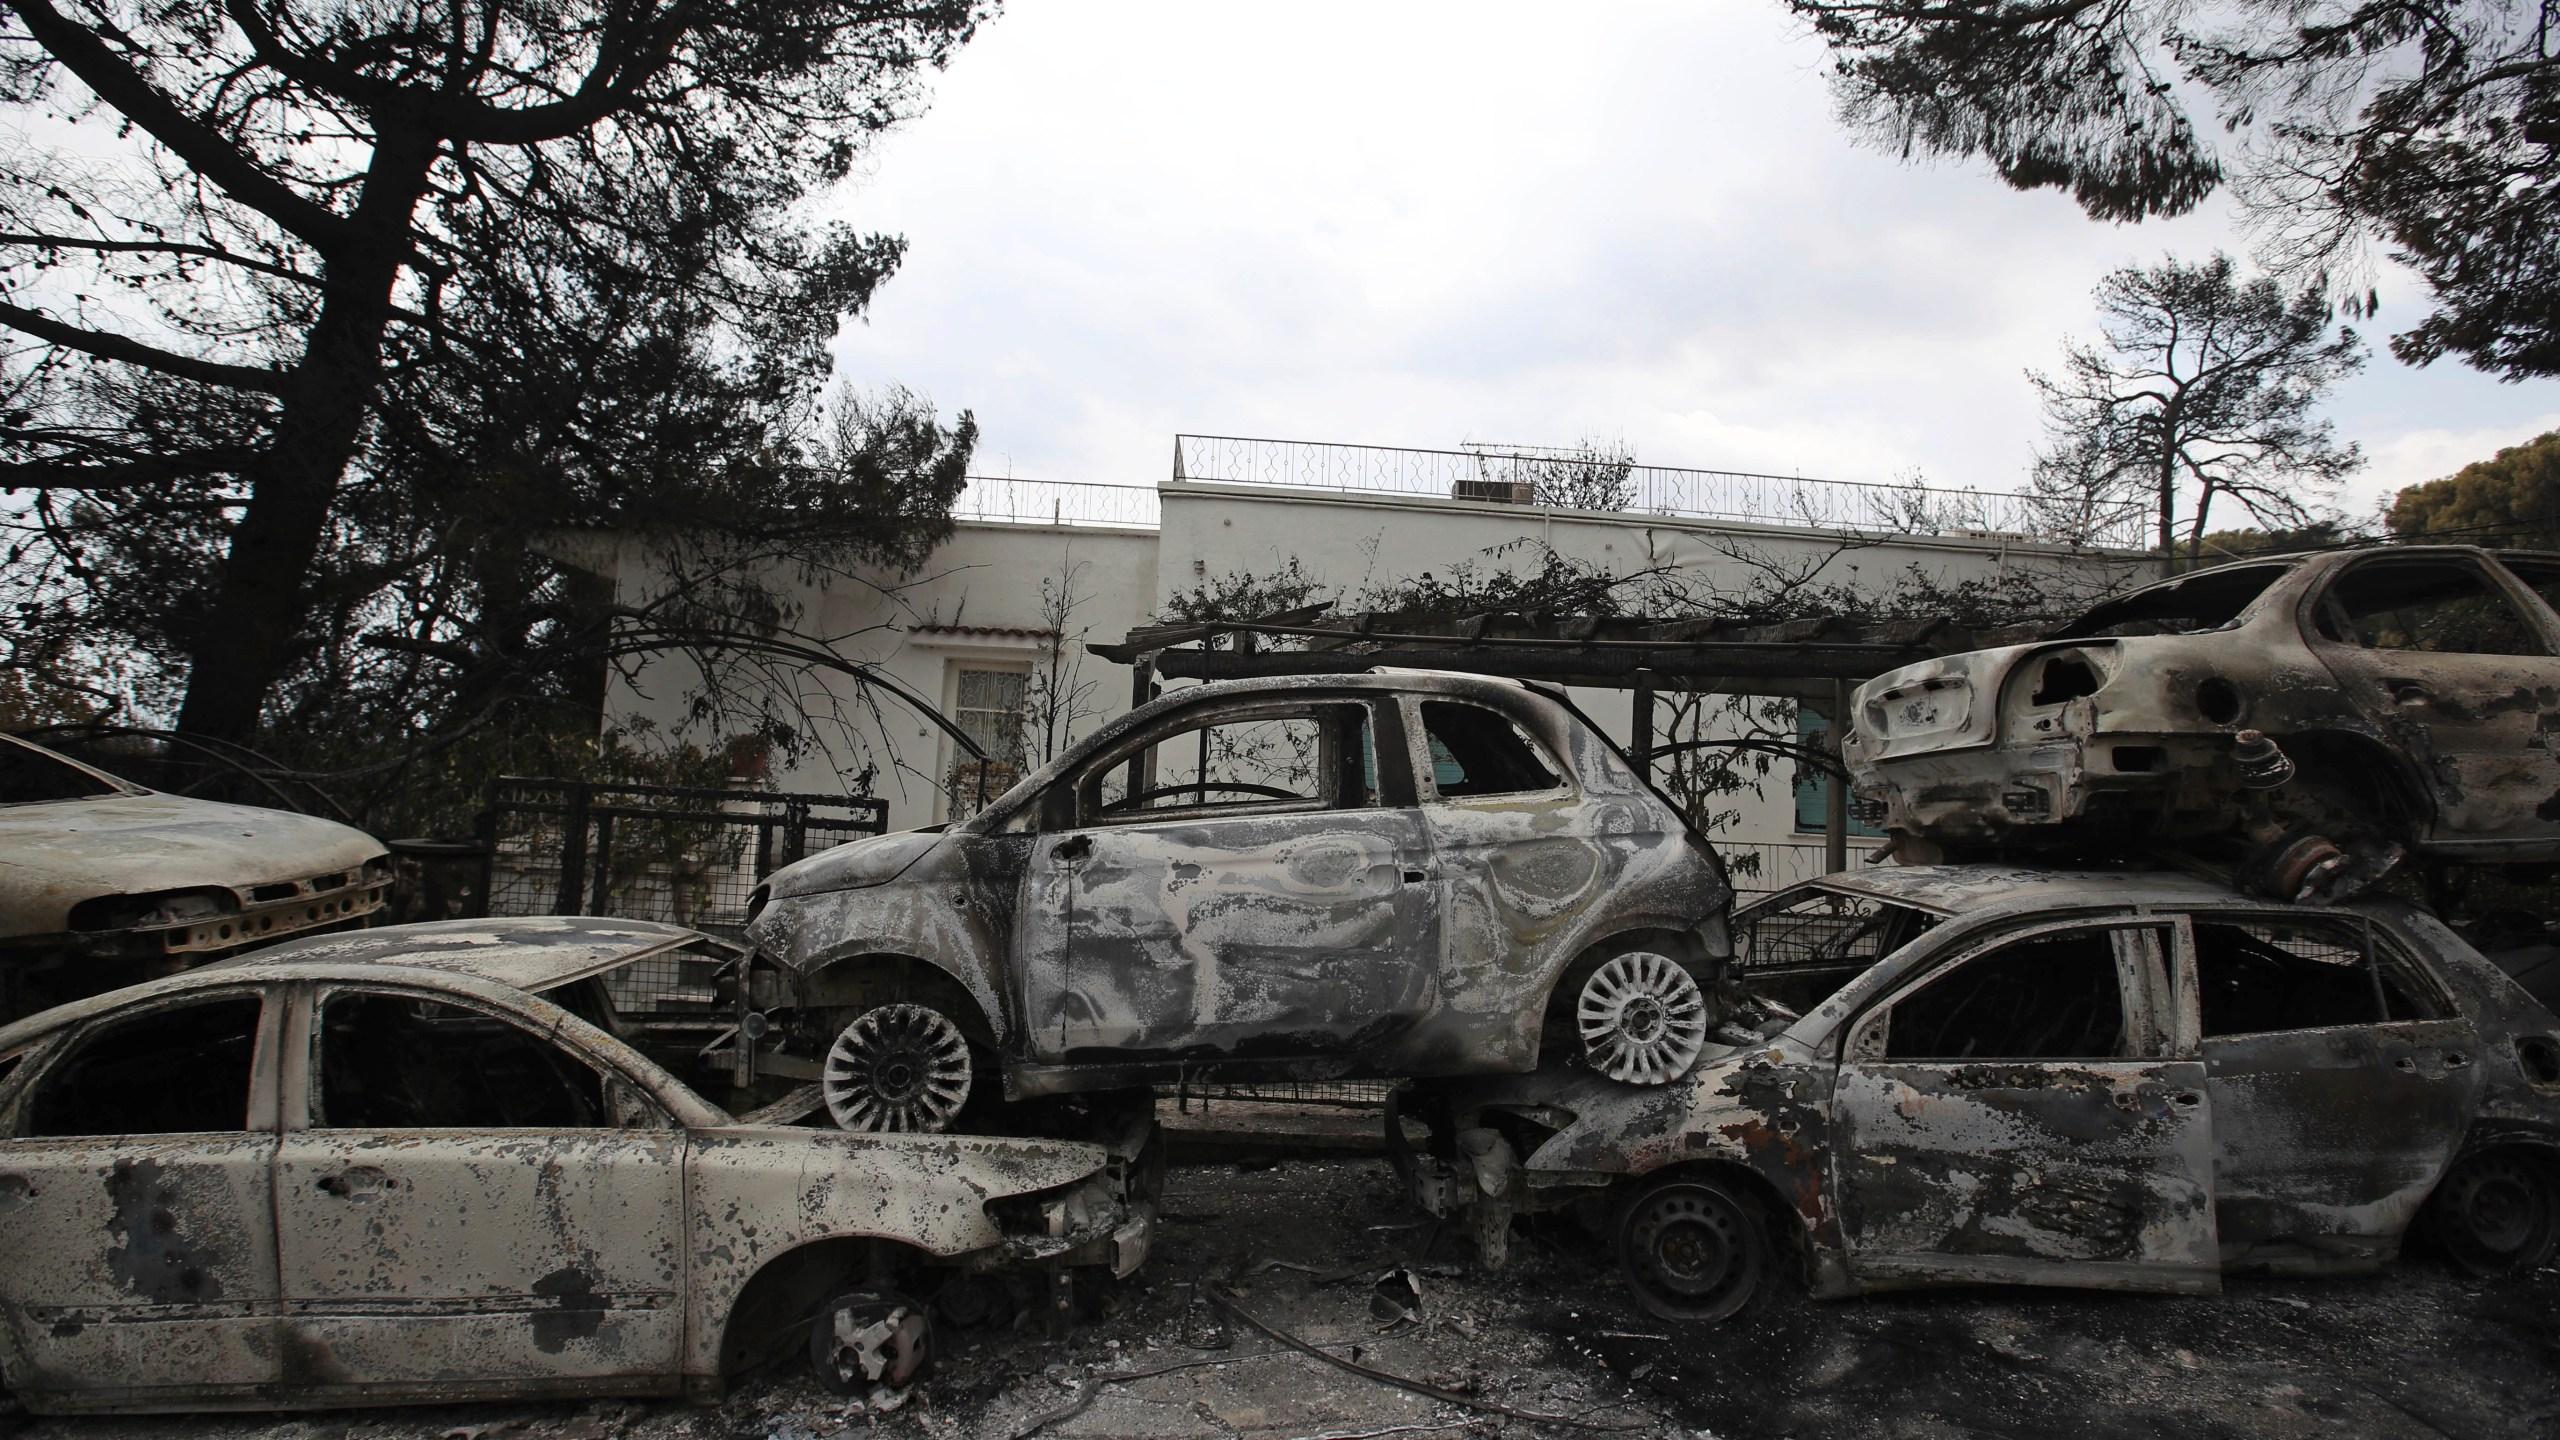 Greece_Forest_Fire_16284-159532.jpg11151163